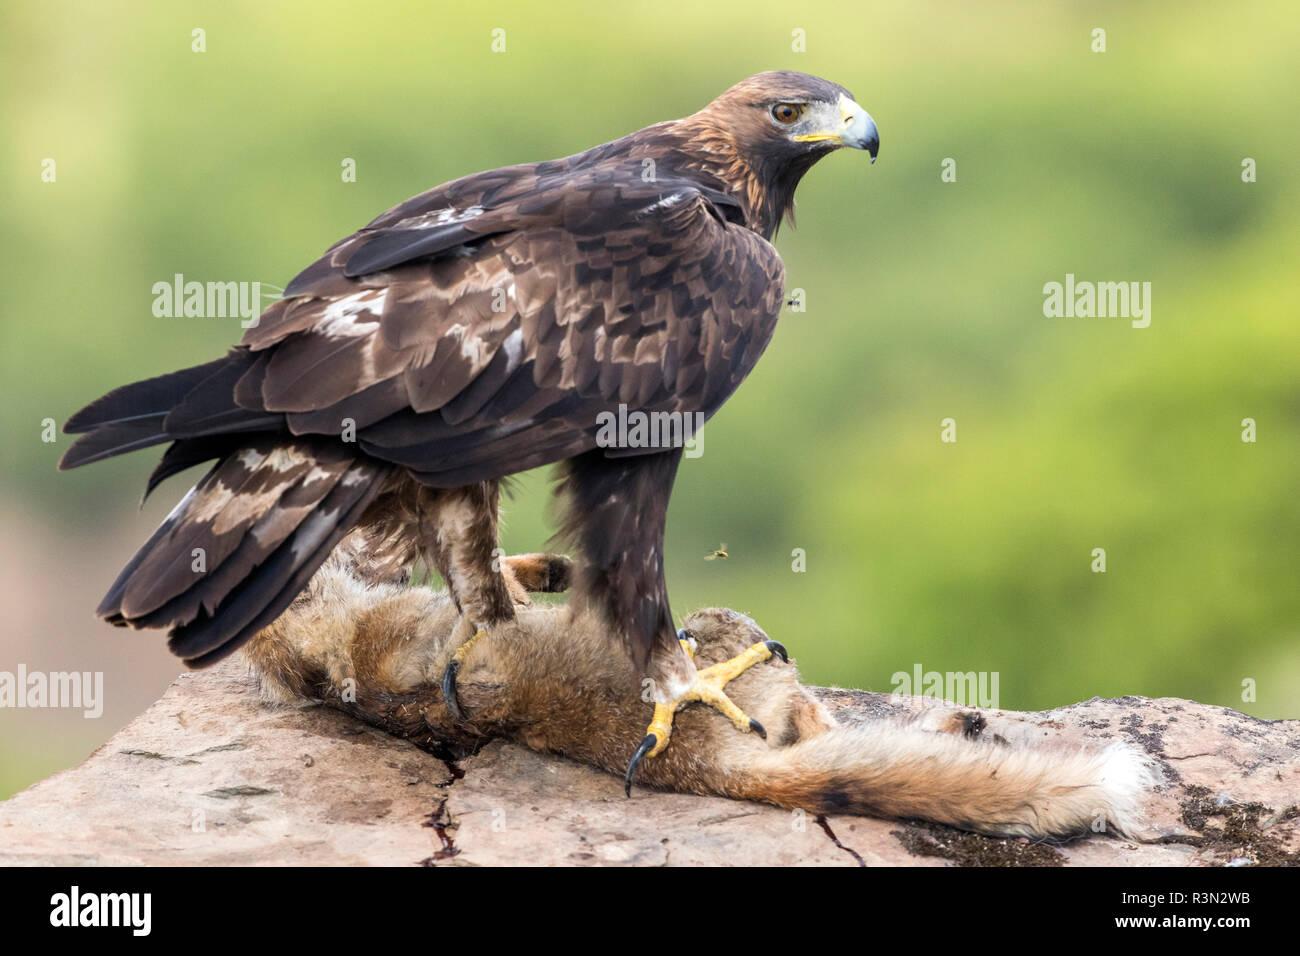 Golden Eagle (Aquila chrysaetos) with prey on rock, Cordoba, Spain - Stock Image